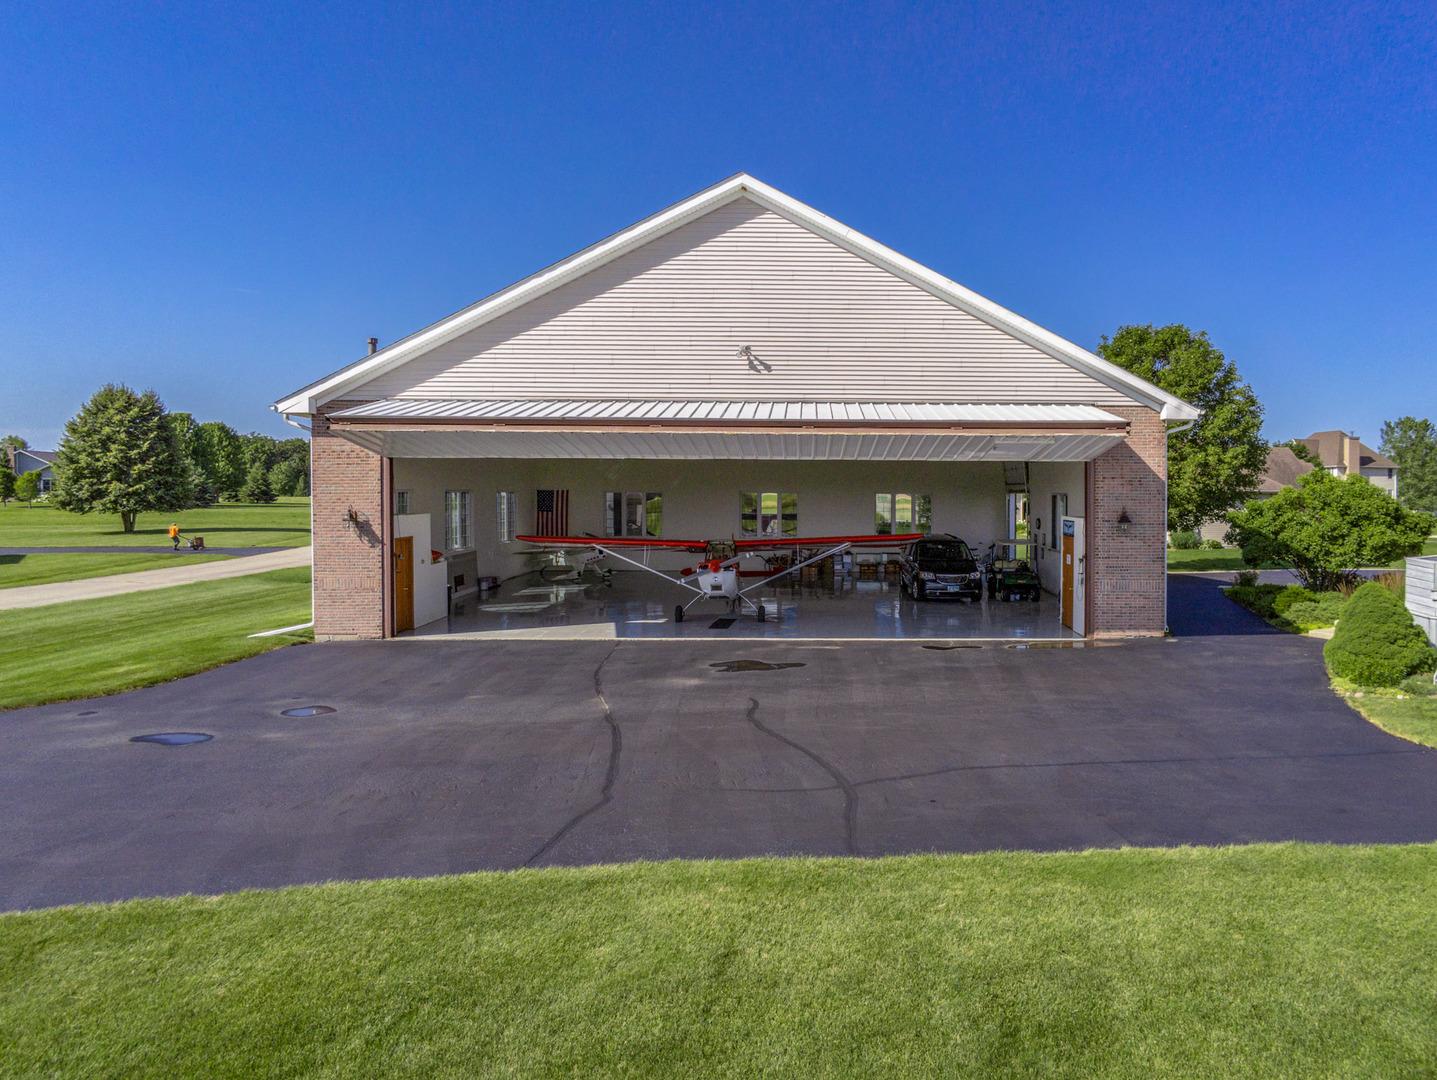 2704 Stearman, Poplar Grove, Illinois, 61065